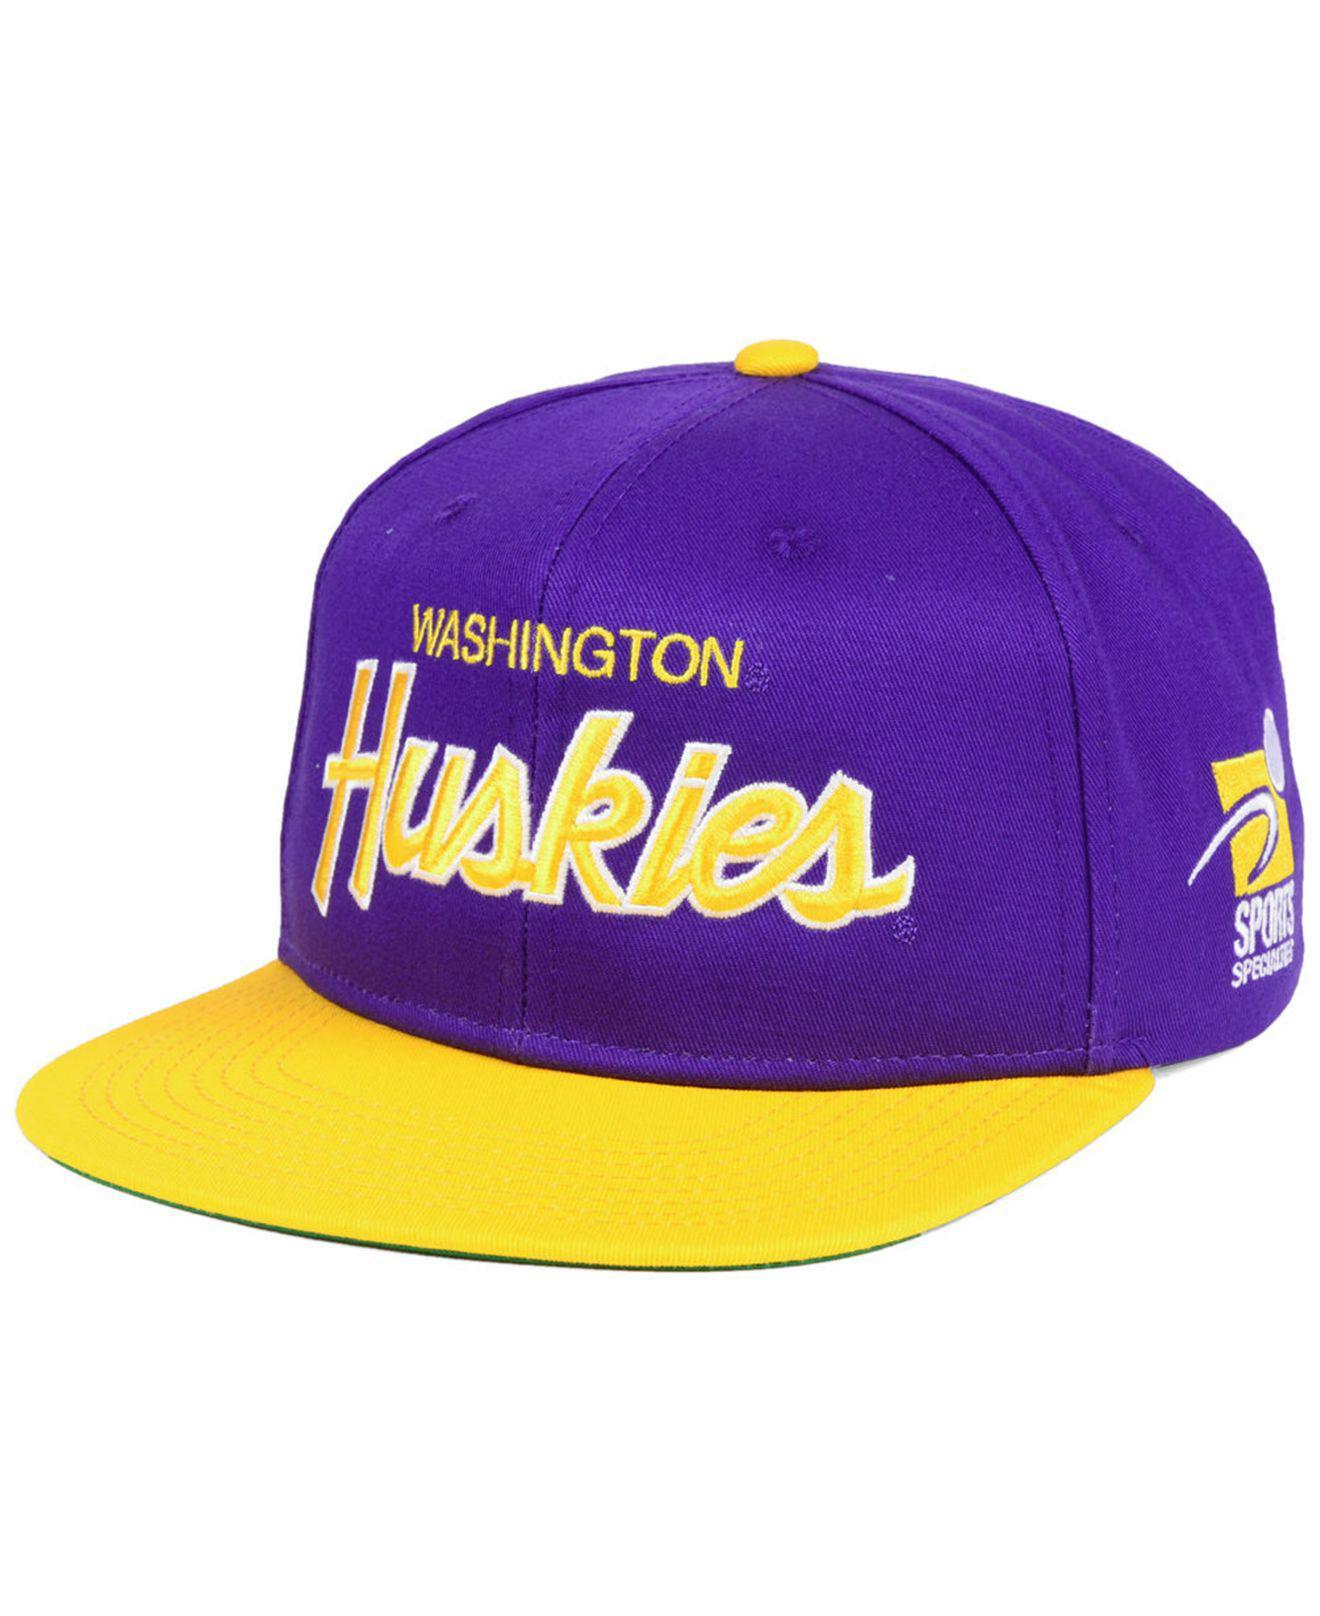 2c8590b261429 ... coupon lyst nike washington huskies sport specialties snapback cap in  148a8 40de1